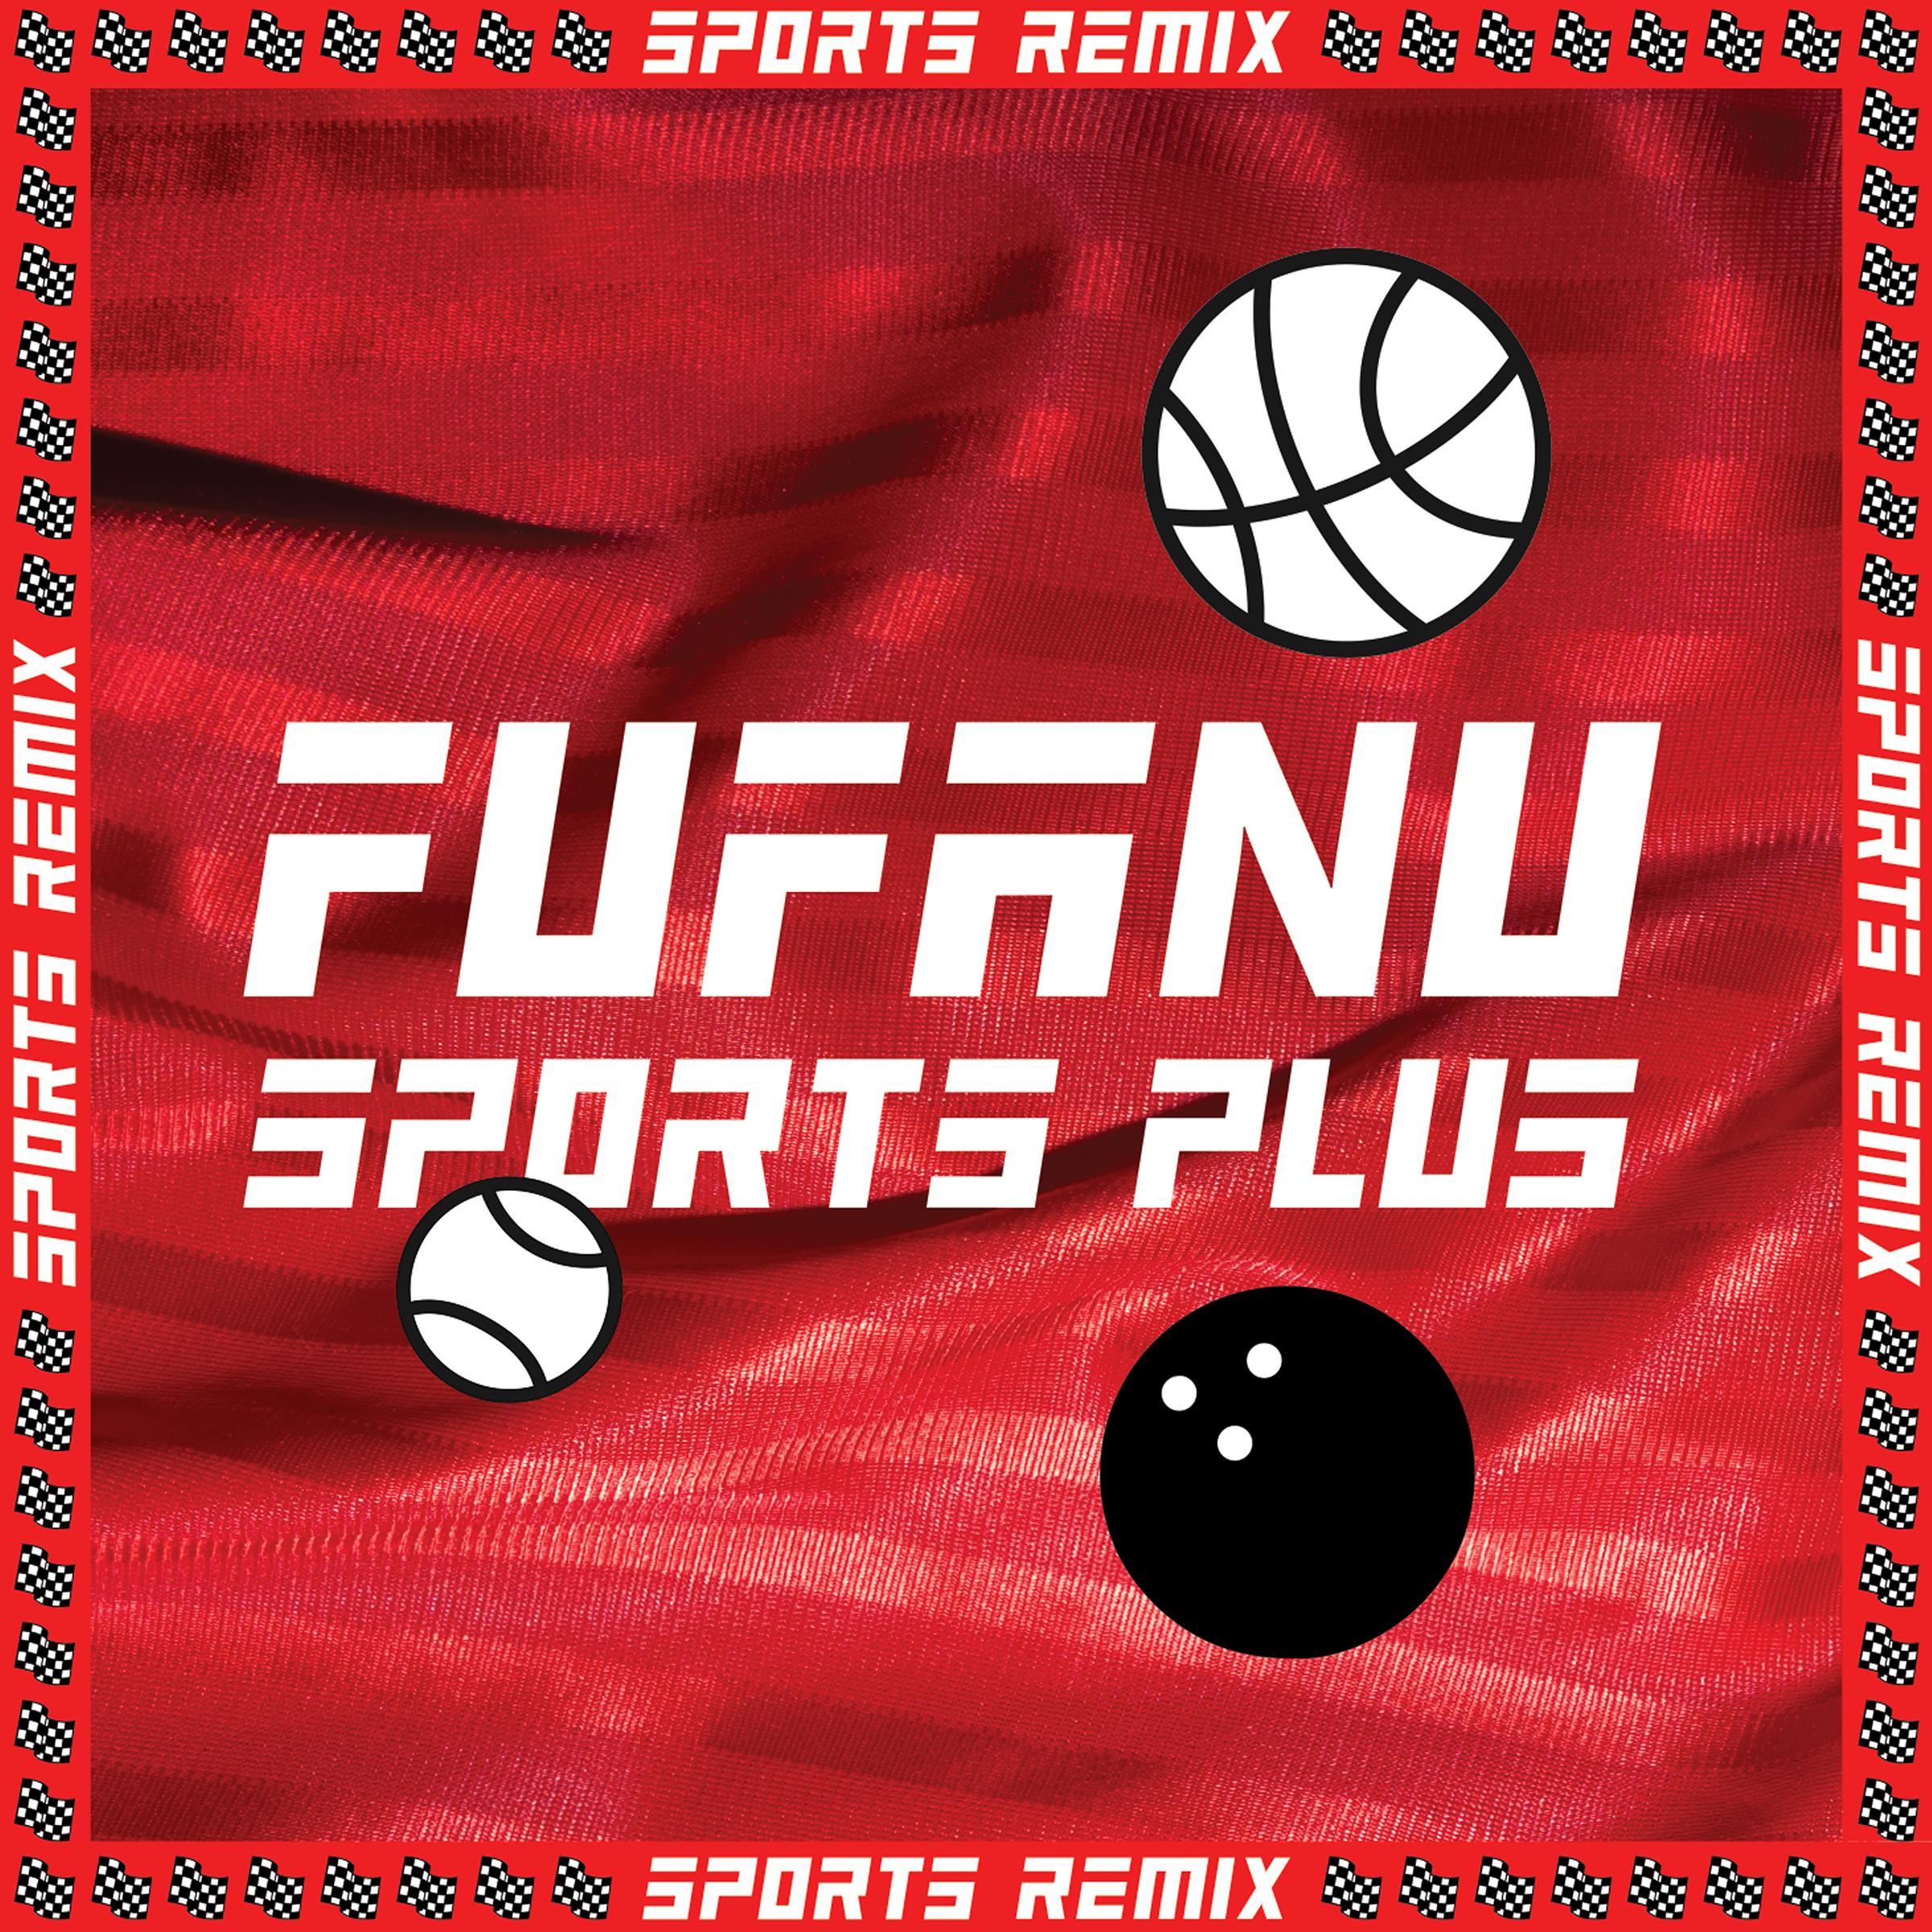 Sports Plus (Remix EP) (Download) - Fufanu